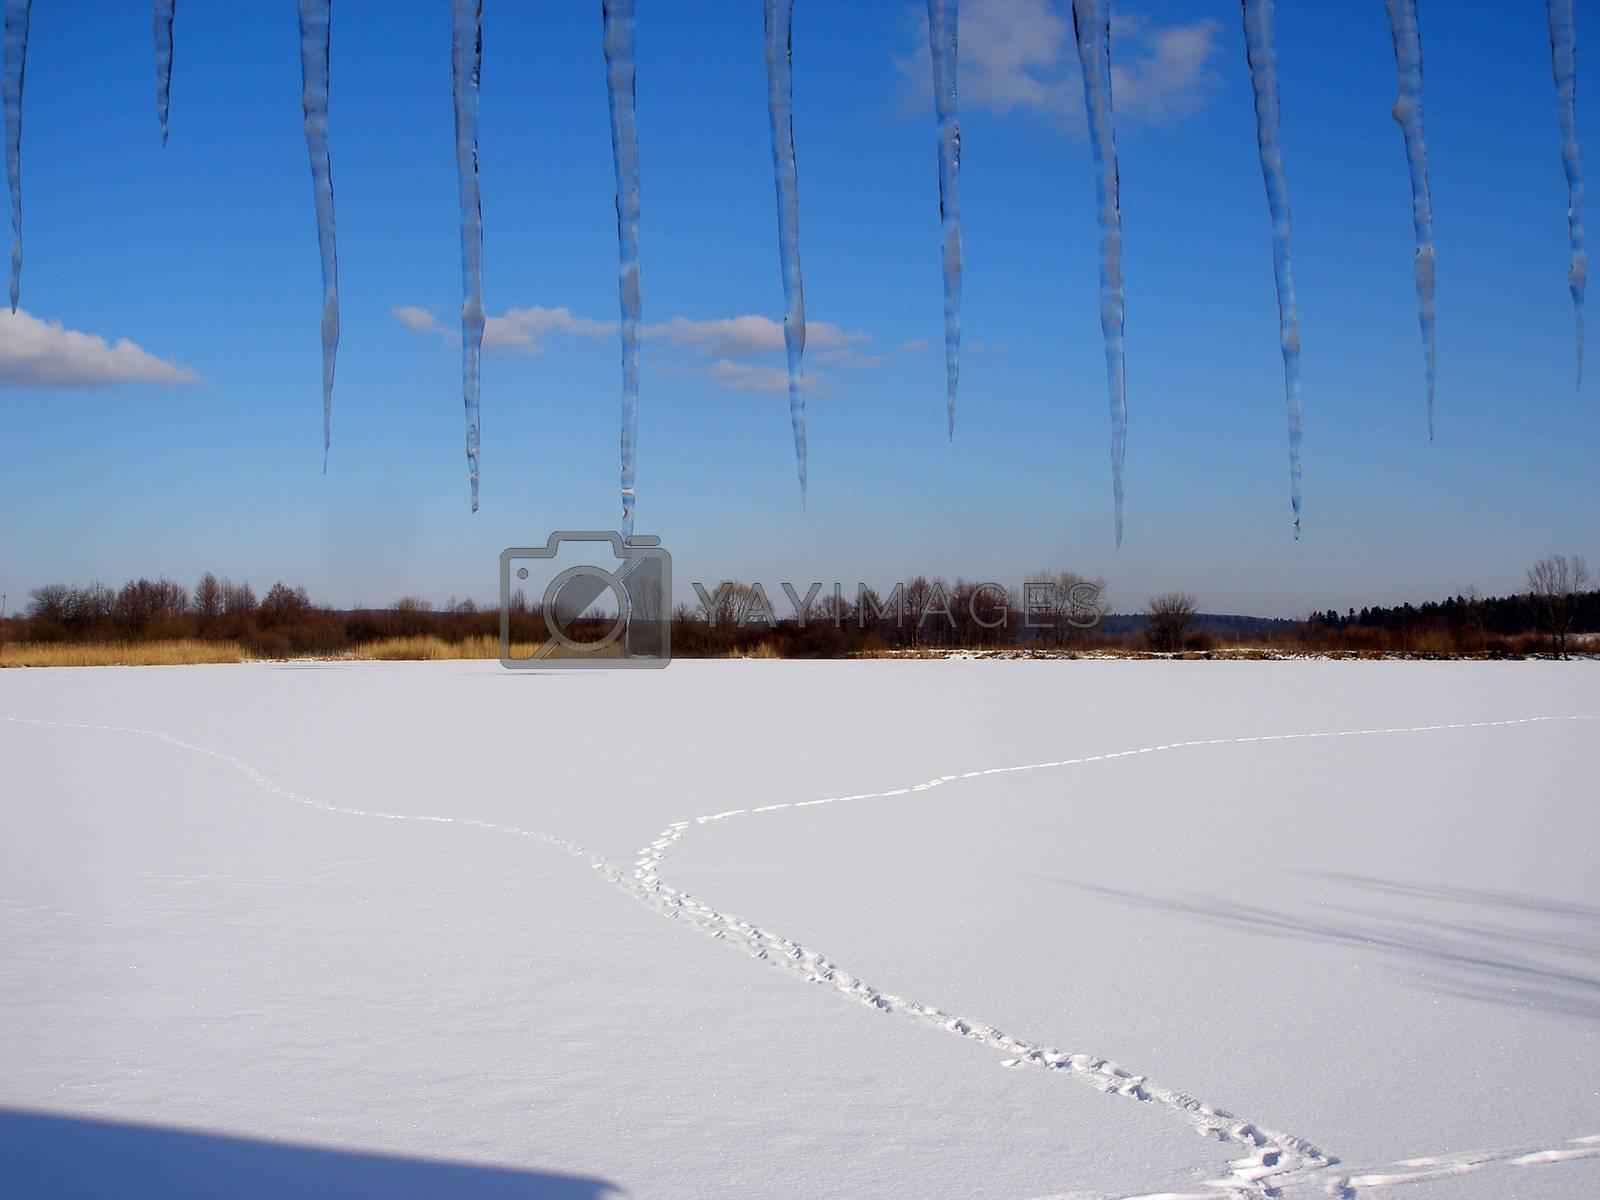 Royalty free image of winter landscape by Irinavk